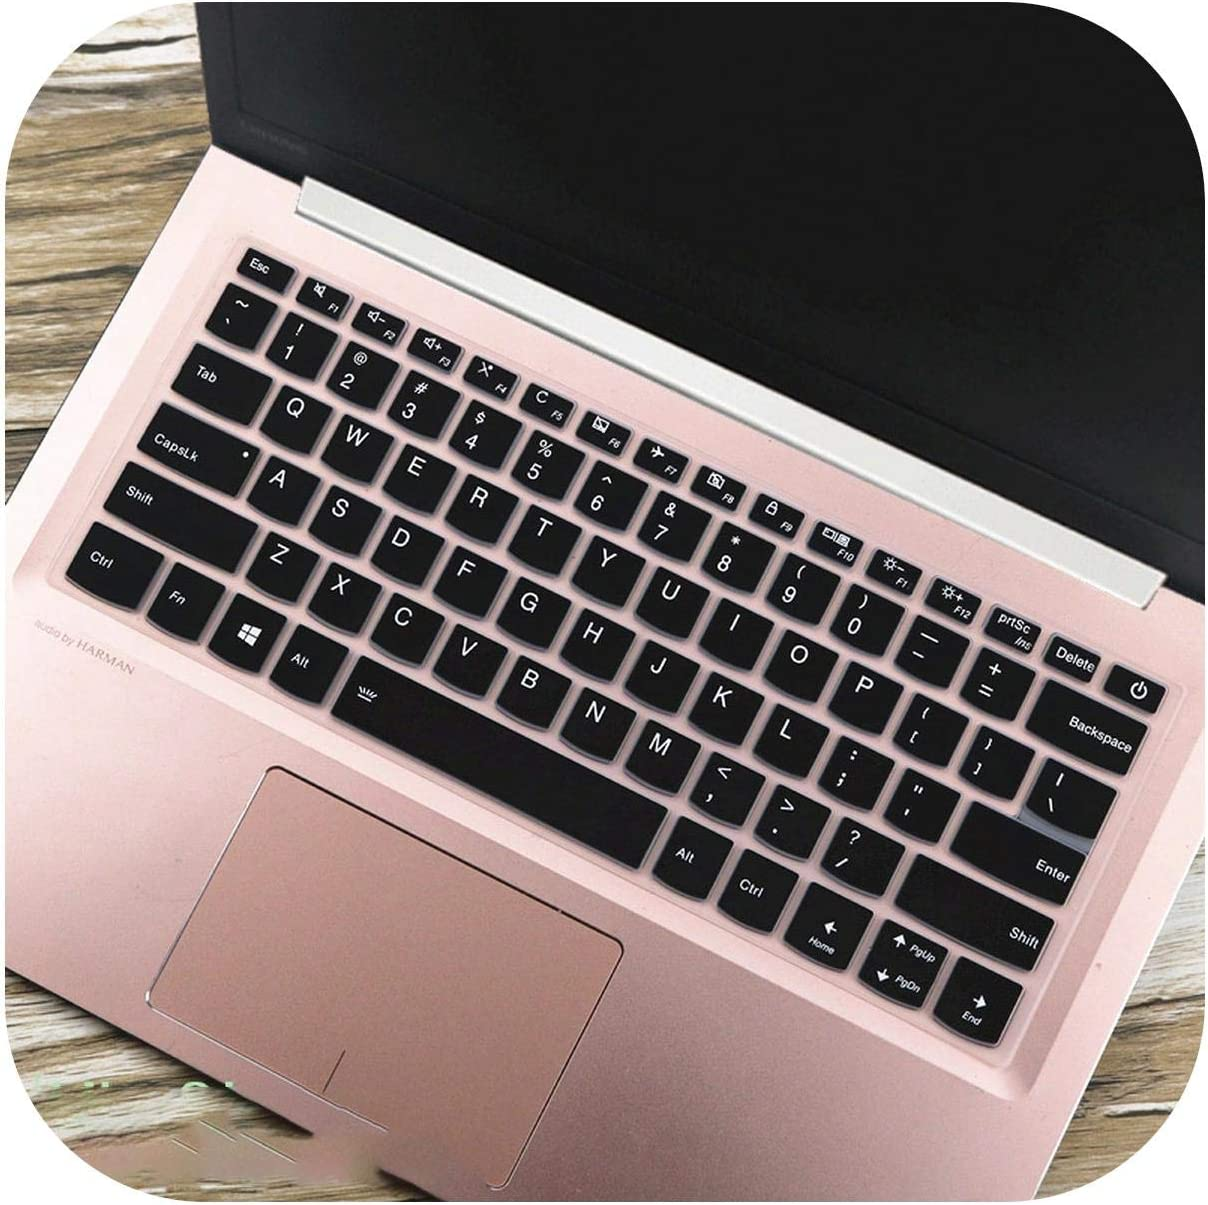 Laptop Notebook Keyboard Cover Skin for Lenovo Yoga 730S 720 720S 13 730 13Ikb 520S 14 Flex 6 14Ikb Ideapad 720S 13 13.3 Inch-Black